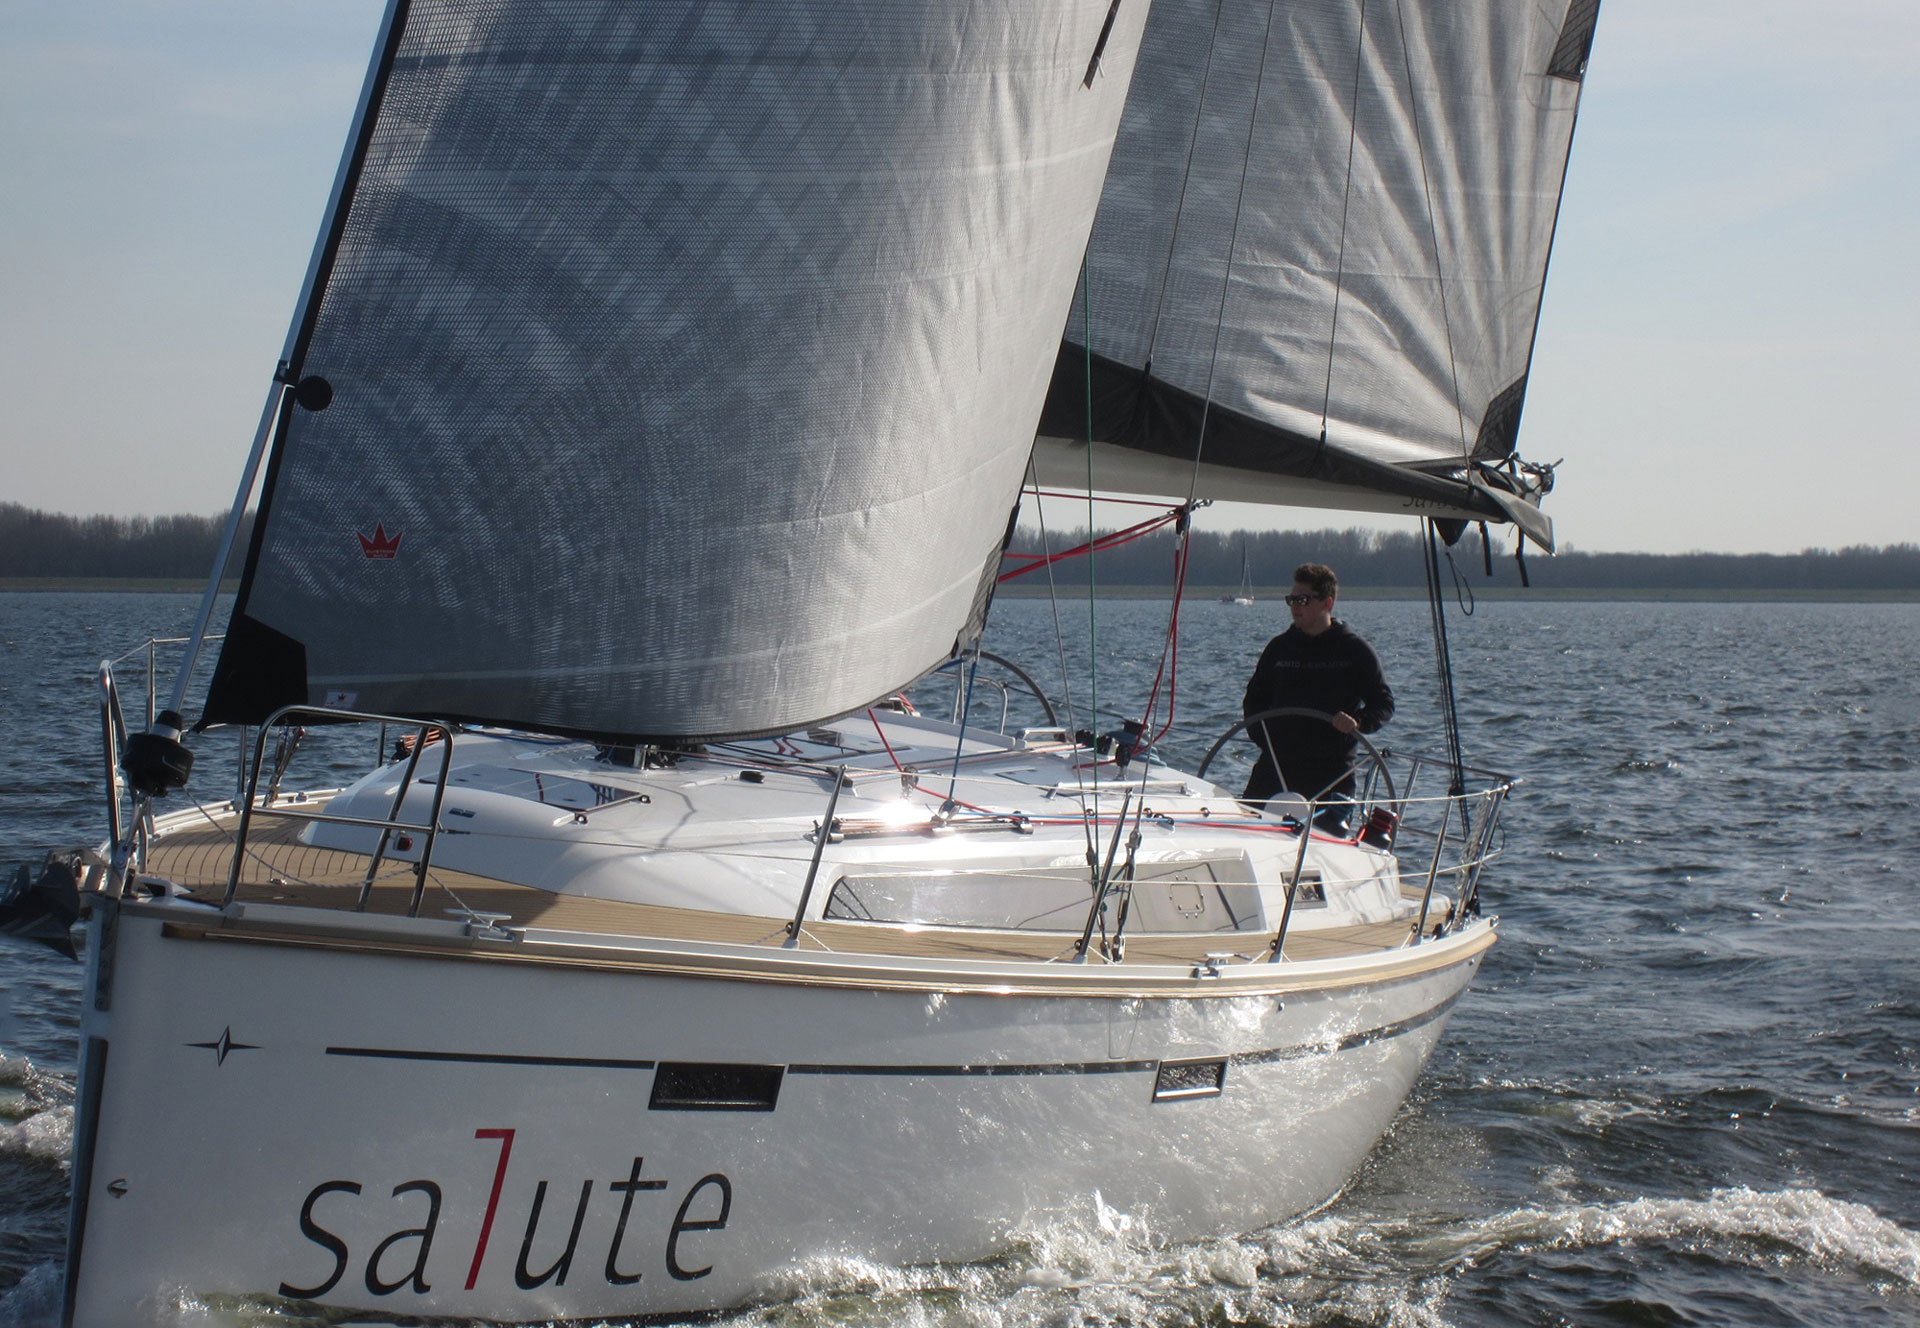 Salute - KM Yachtcharter